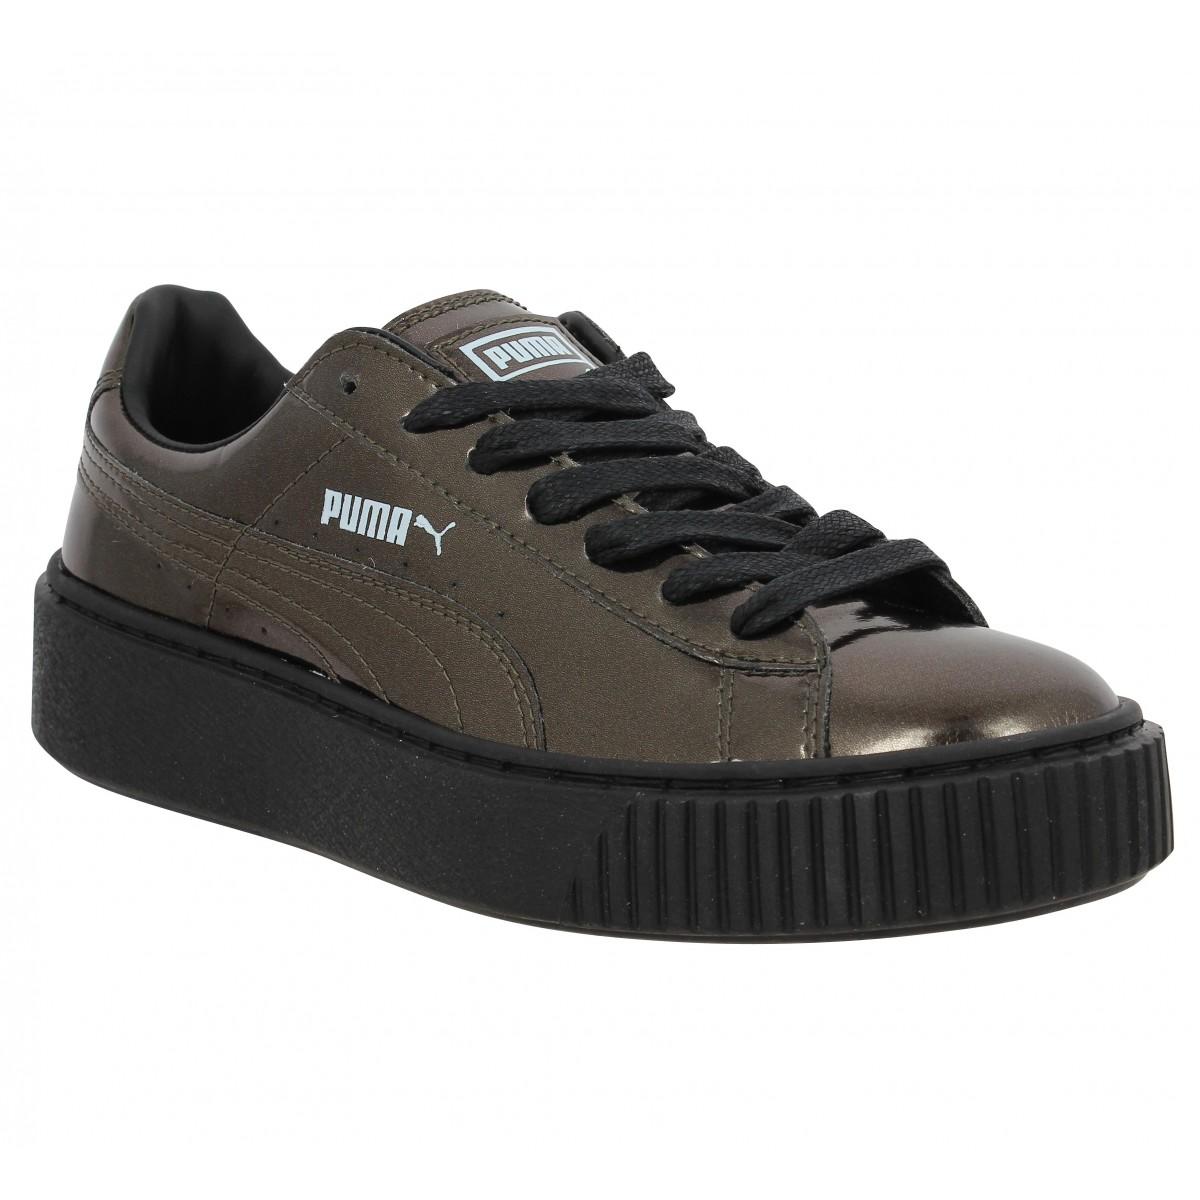 Puma FemmeFanny Basket Platform Noir Metallic Chaussures hQtdrsC